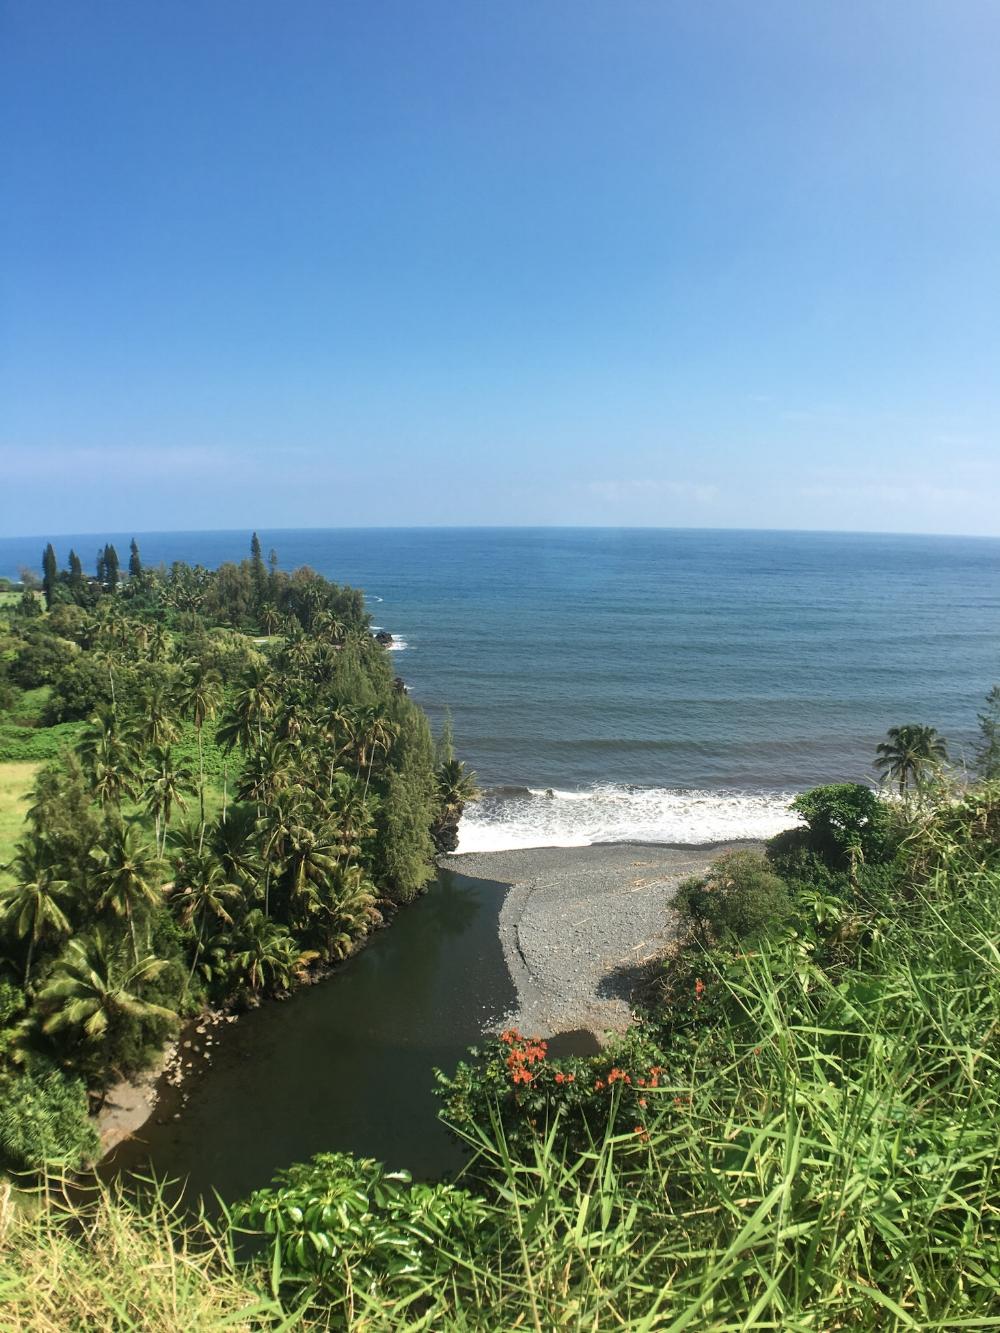 curio.trips.hawaii.maui.hana.black.beach.jpg